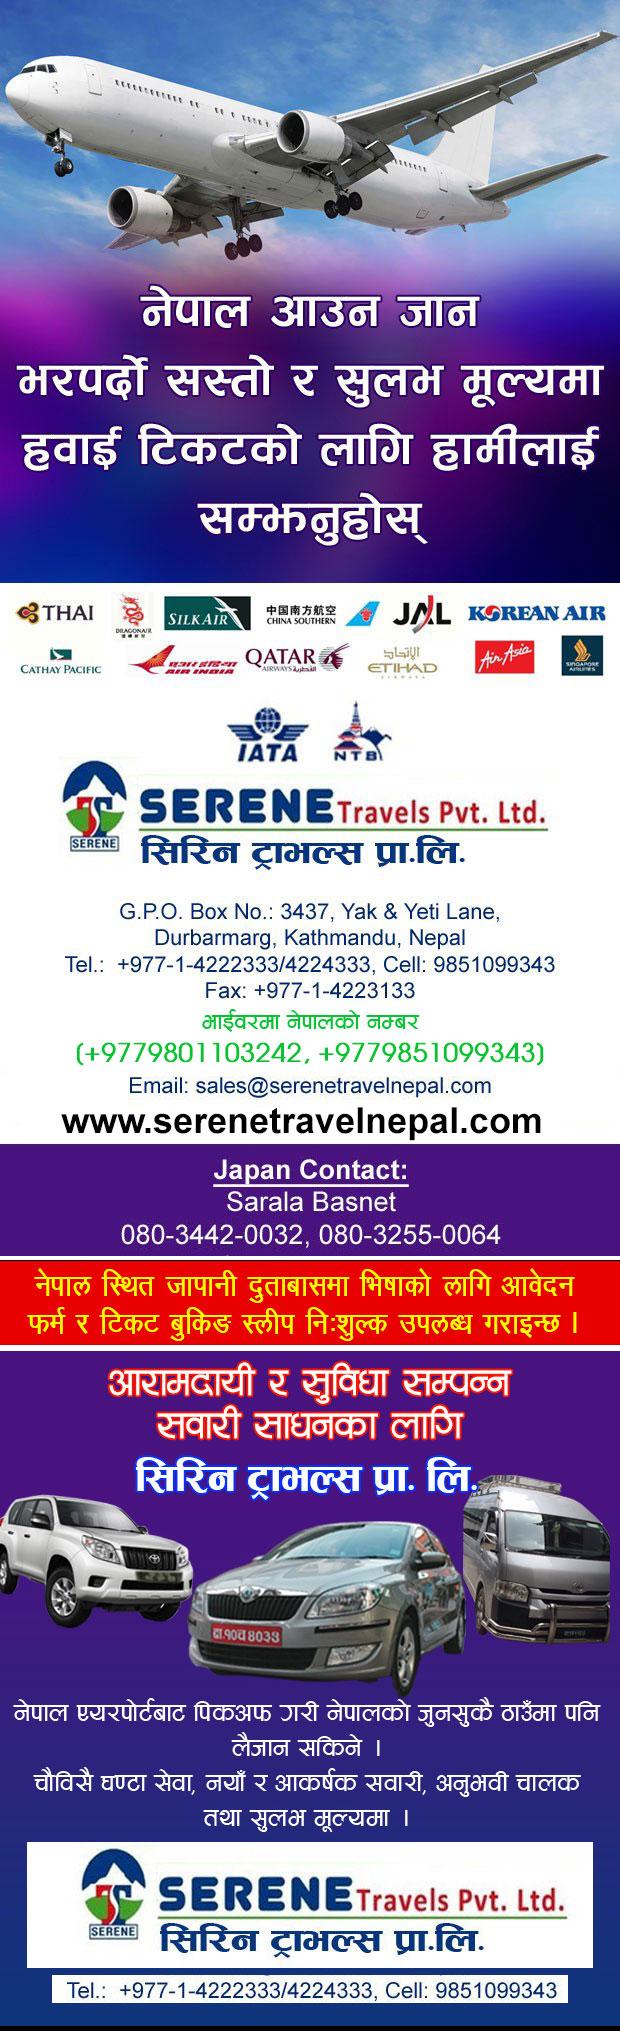 serene-web2